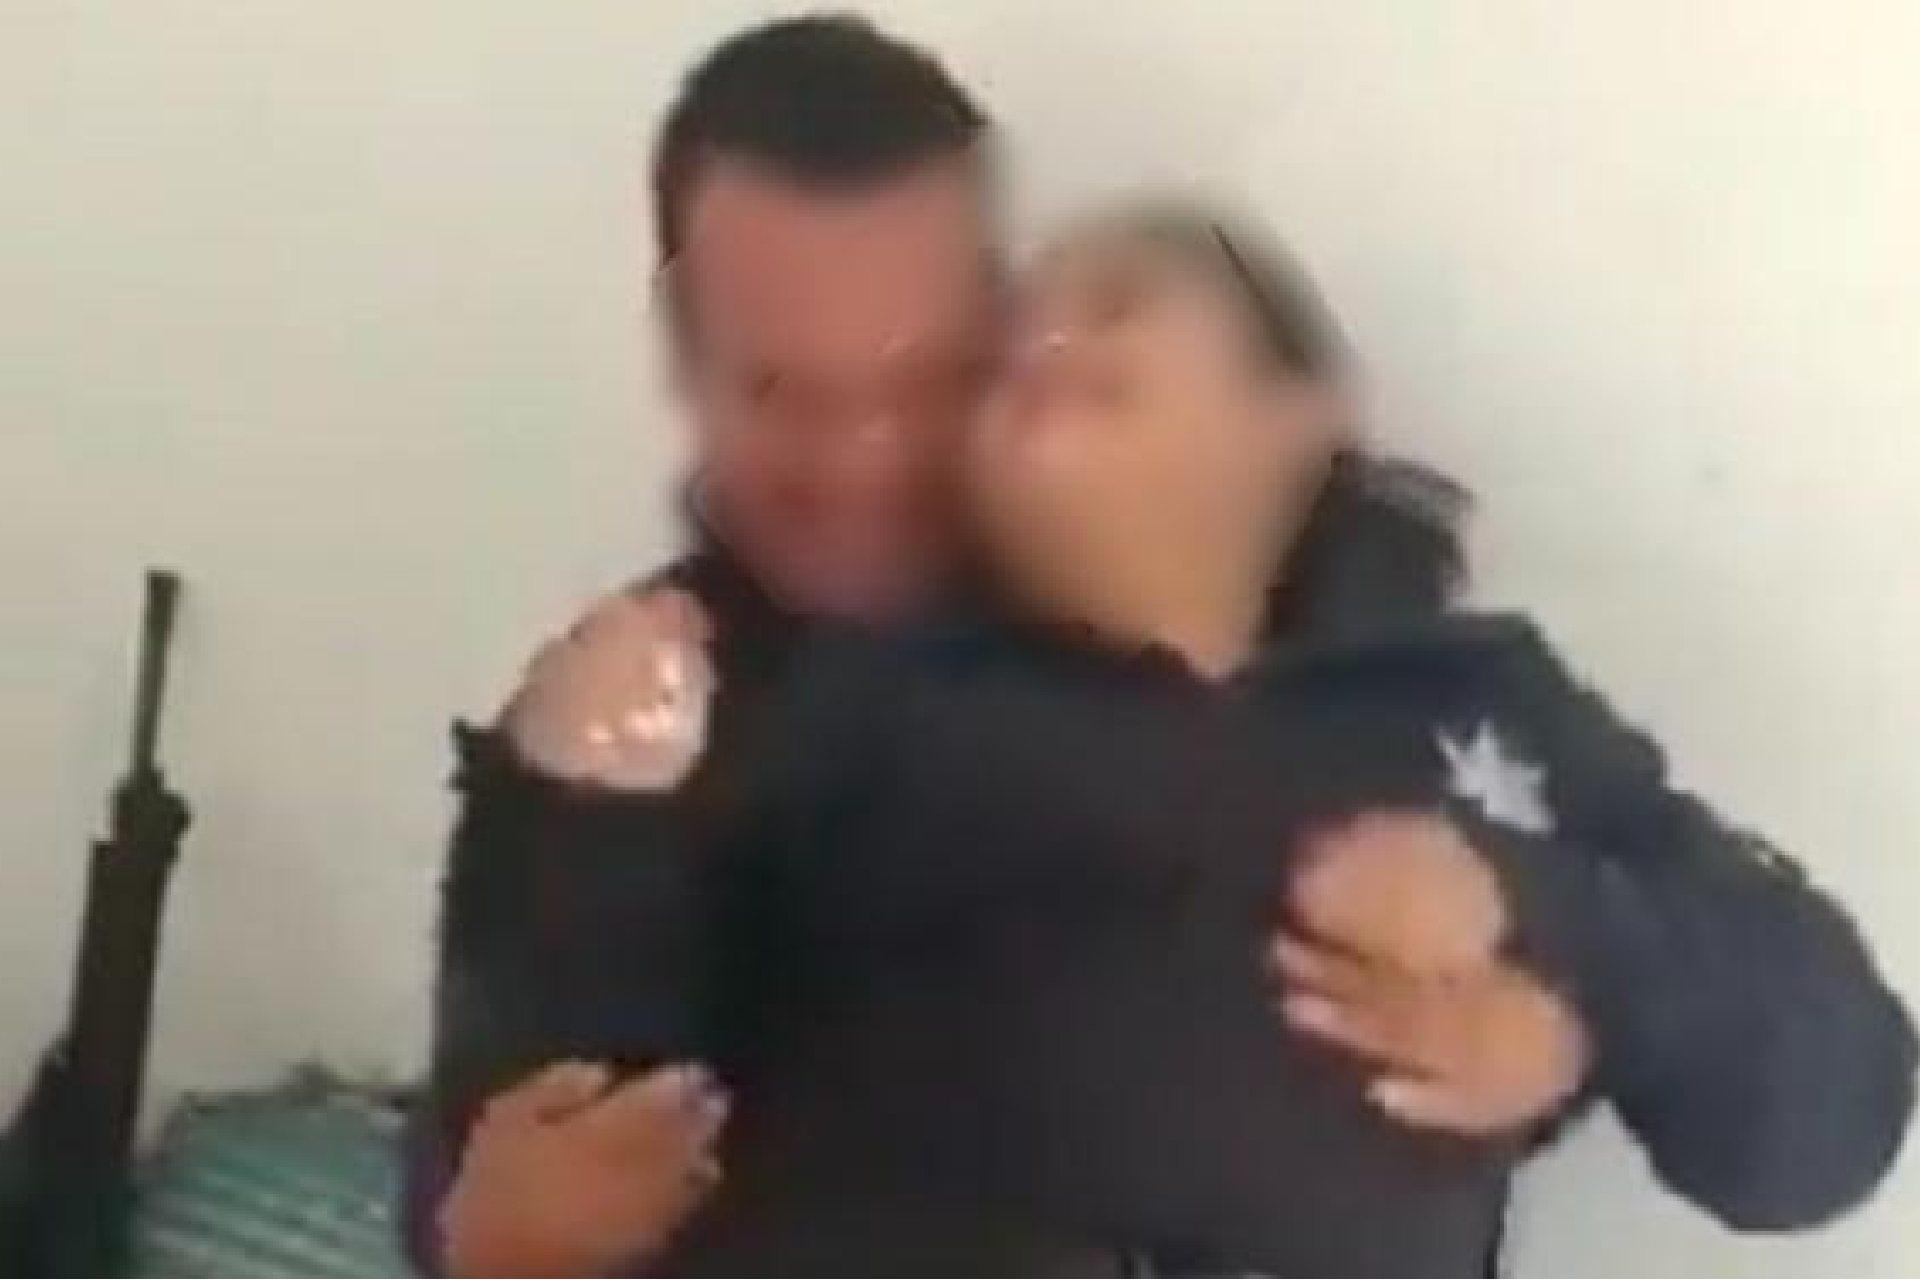 violan-derechos-policias-tepetitla-Tlaxcala-mexico